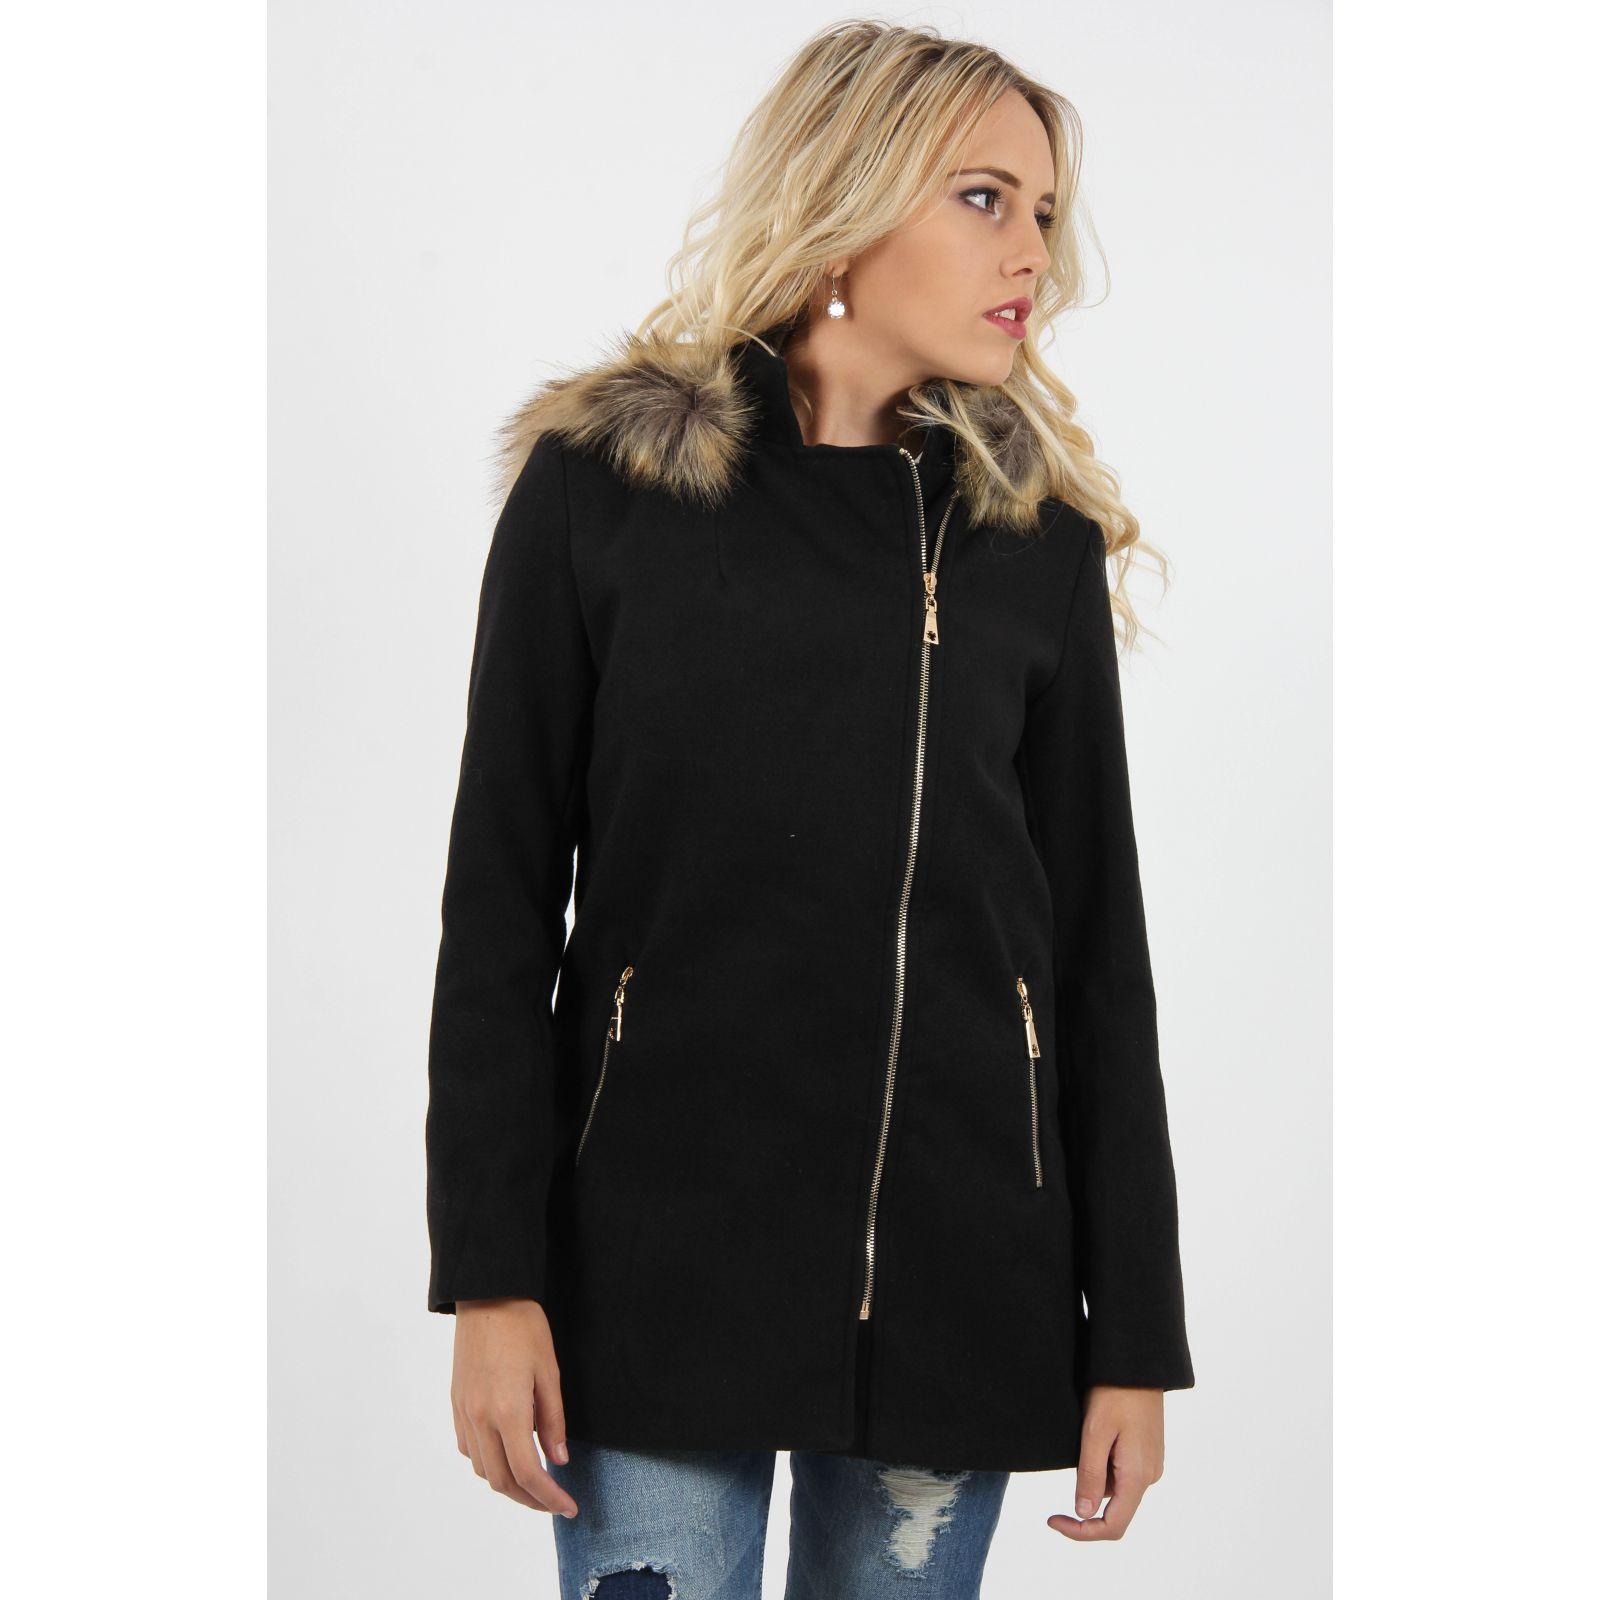 manteau noir femme capuche. Black Bedroom Furniture Sets. Home Design Ideas